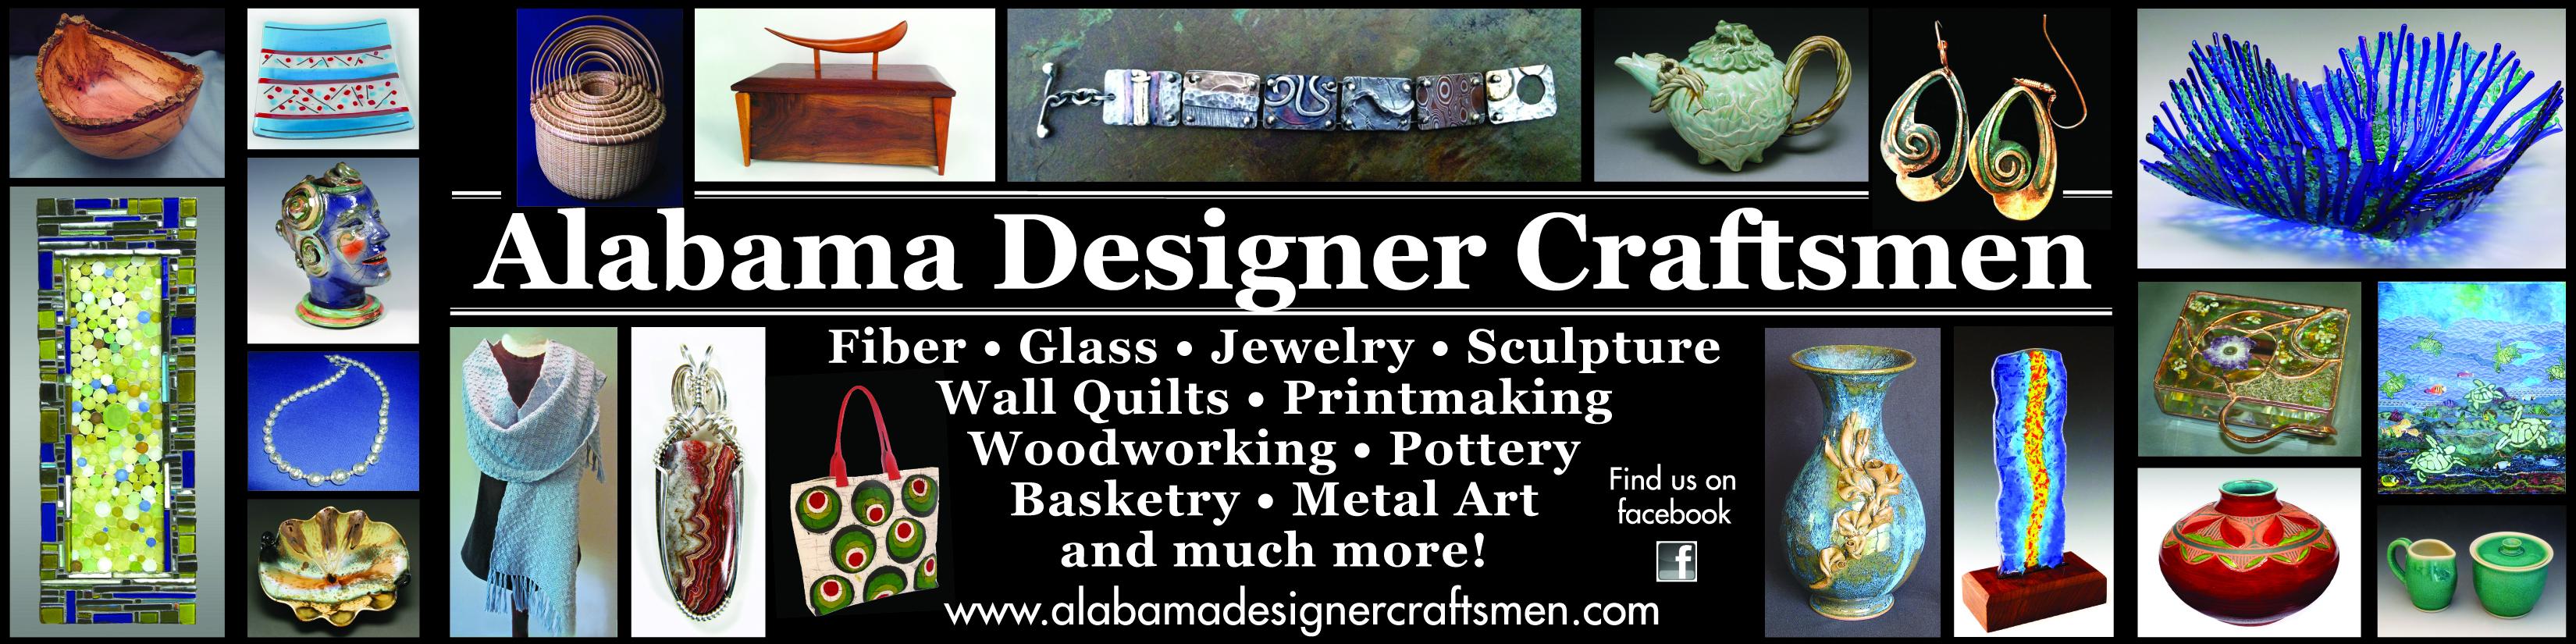 Alabama Designer Craftsman 47th Craft Show at the Birmingham Botanical Gardens